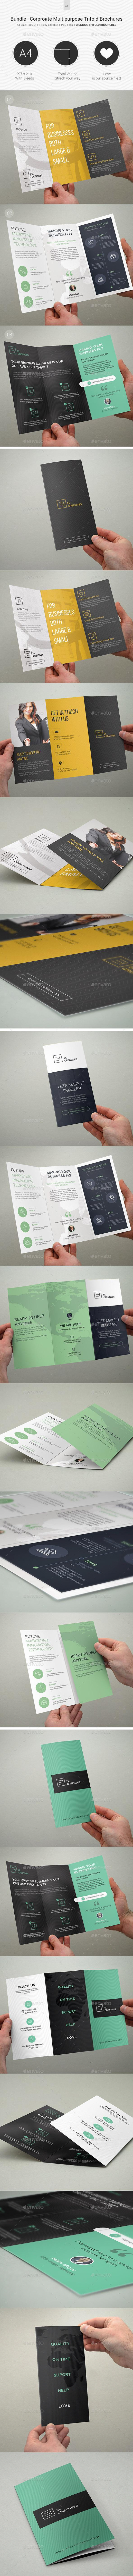 Bundle - Creative Trifold Brochures - 07 - Corporate Brochures